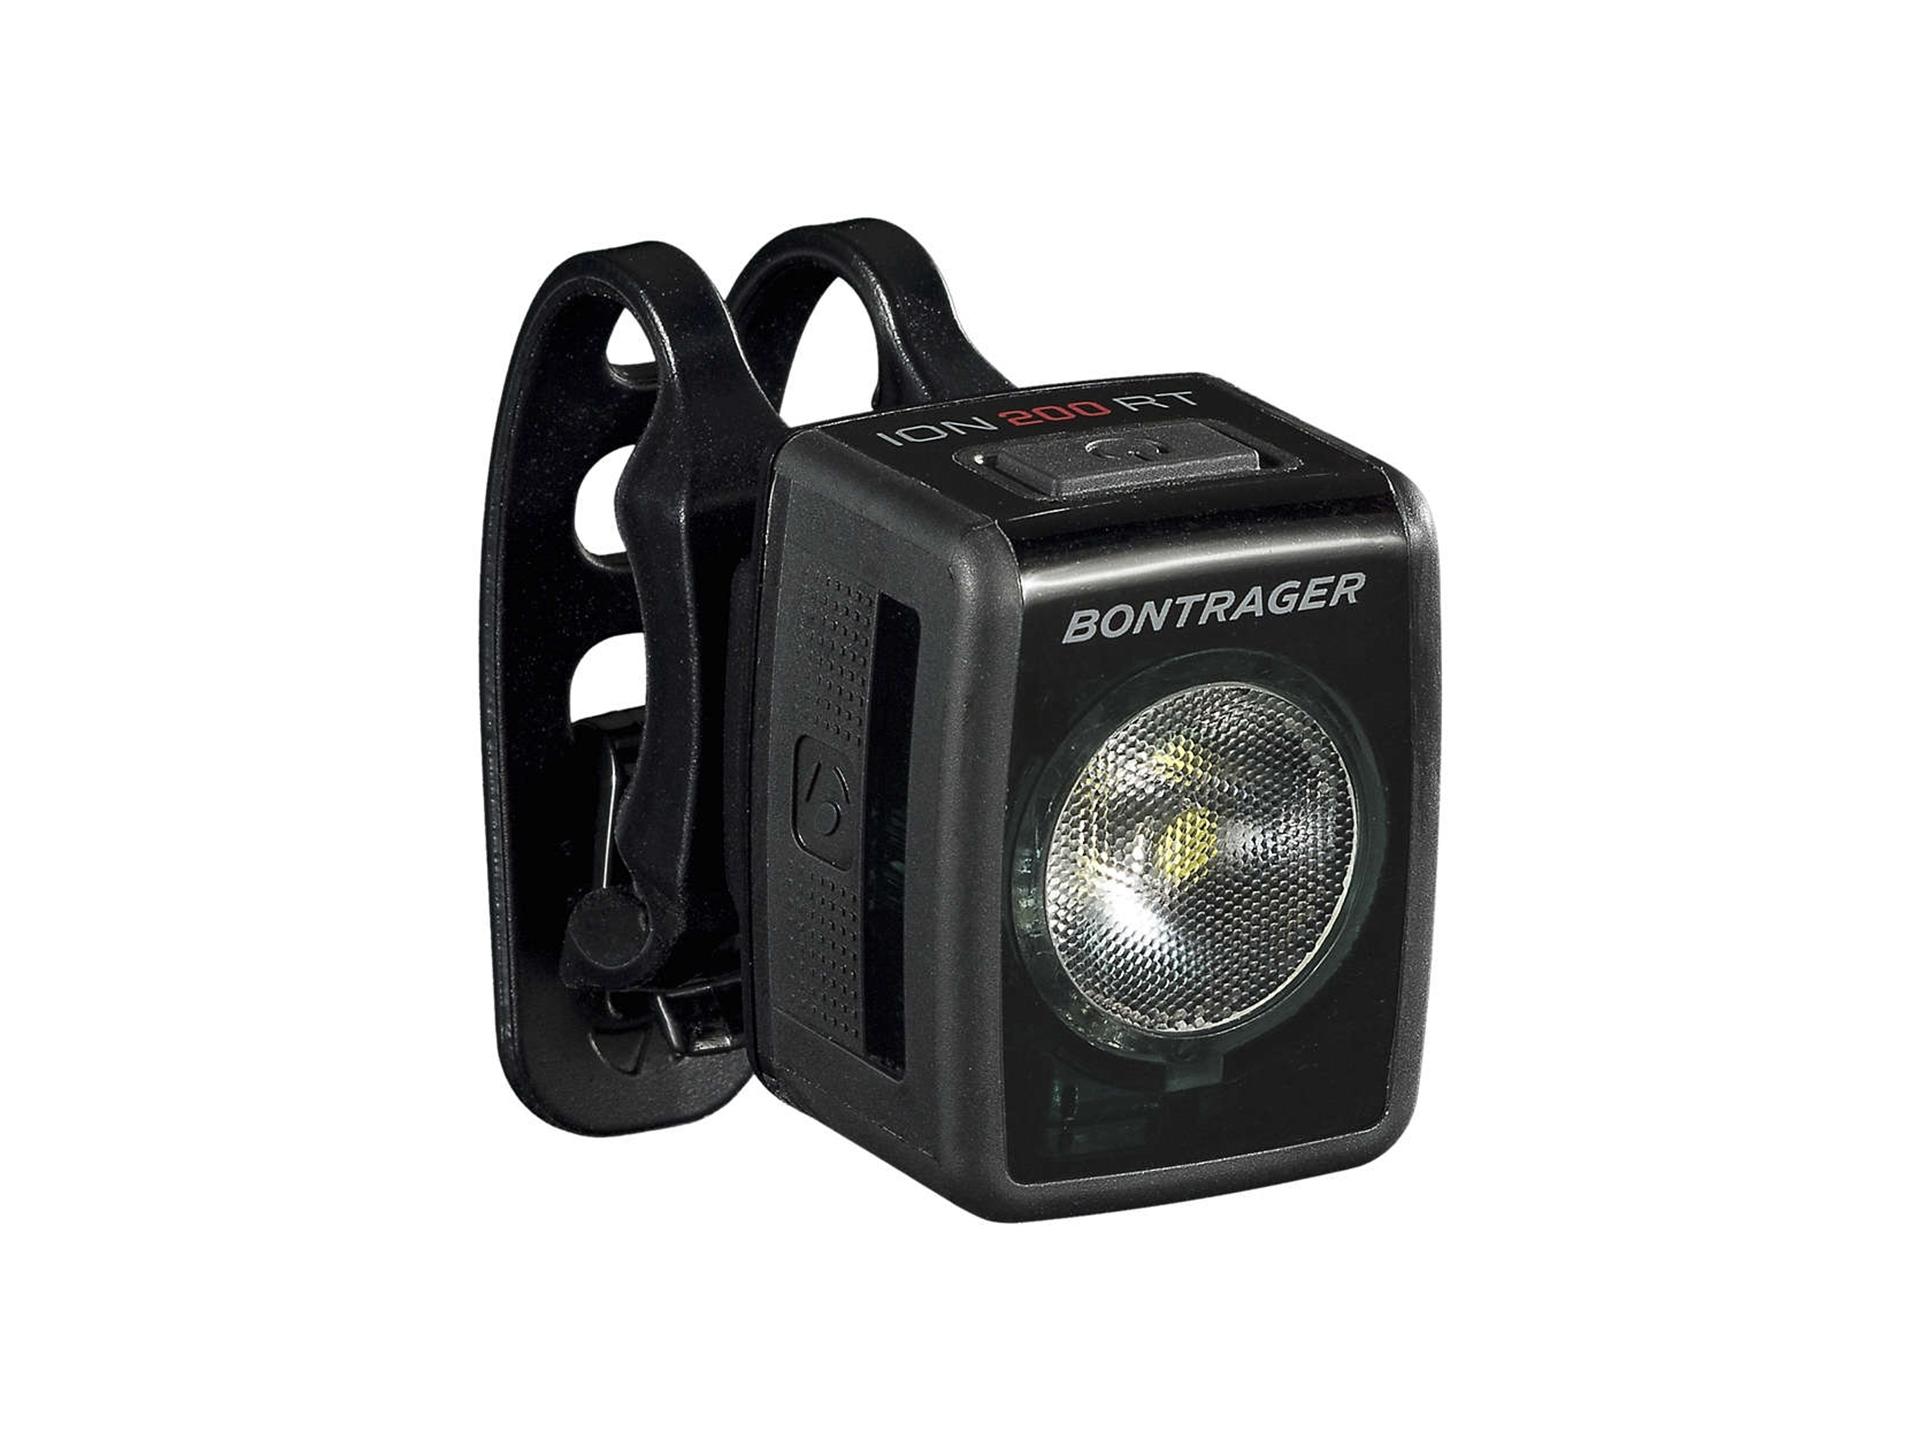 Bontrager Ion 200 RT Framdiod Säkerhetslampa